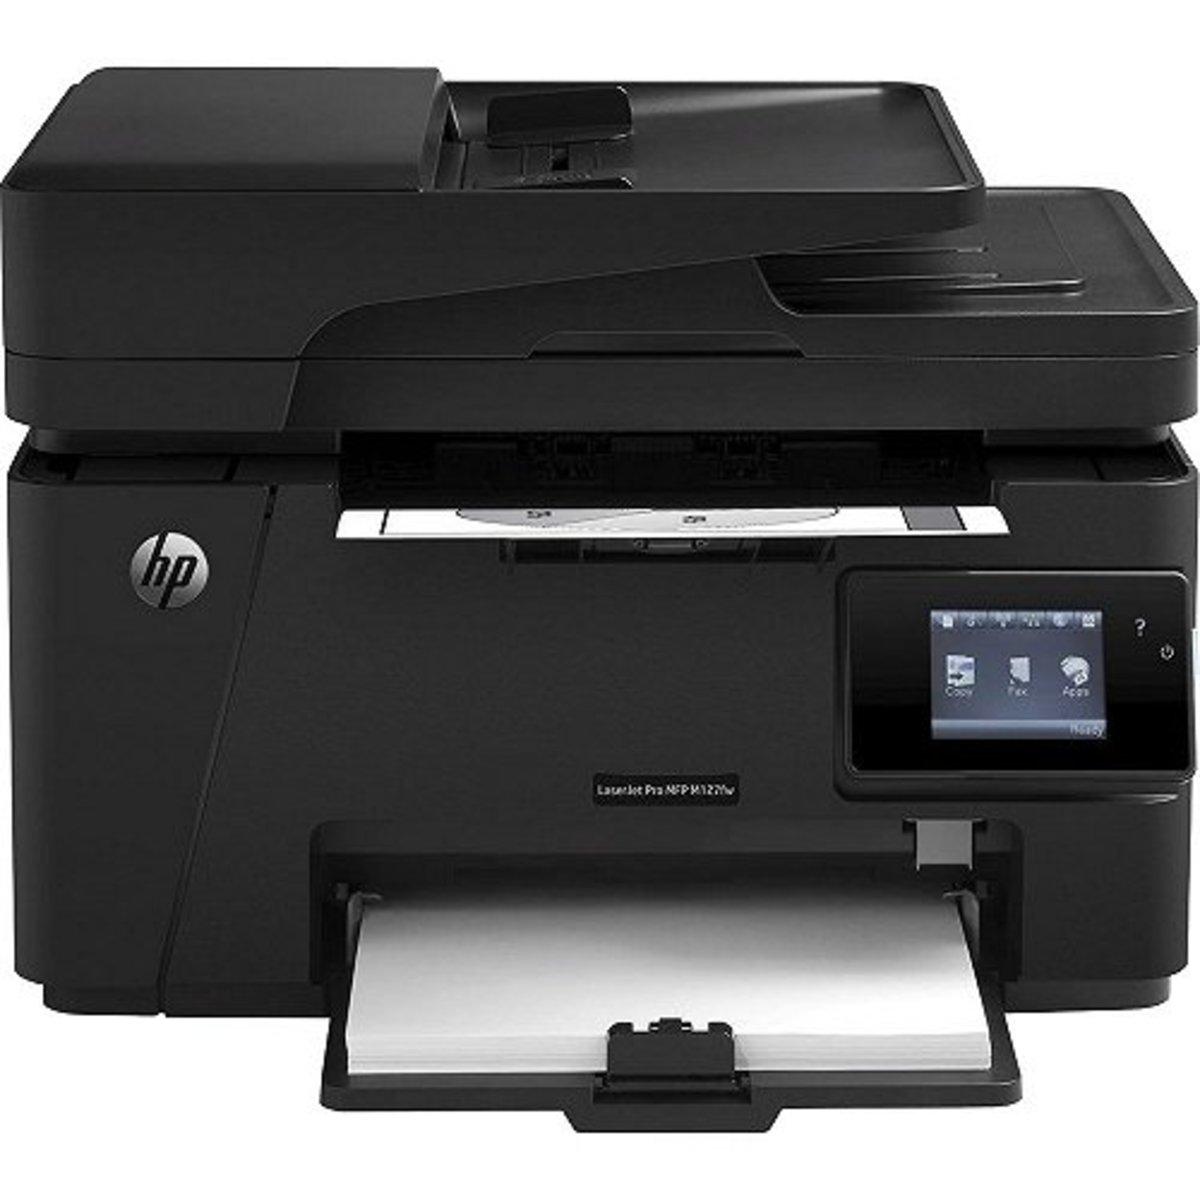 HP M127FW Wireless Monochrome Laserjet Printer